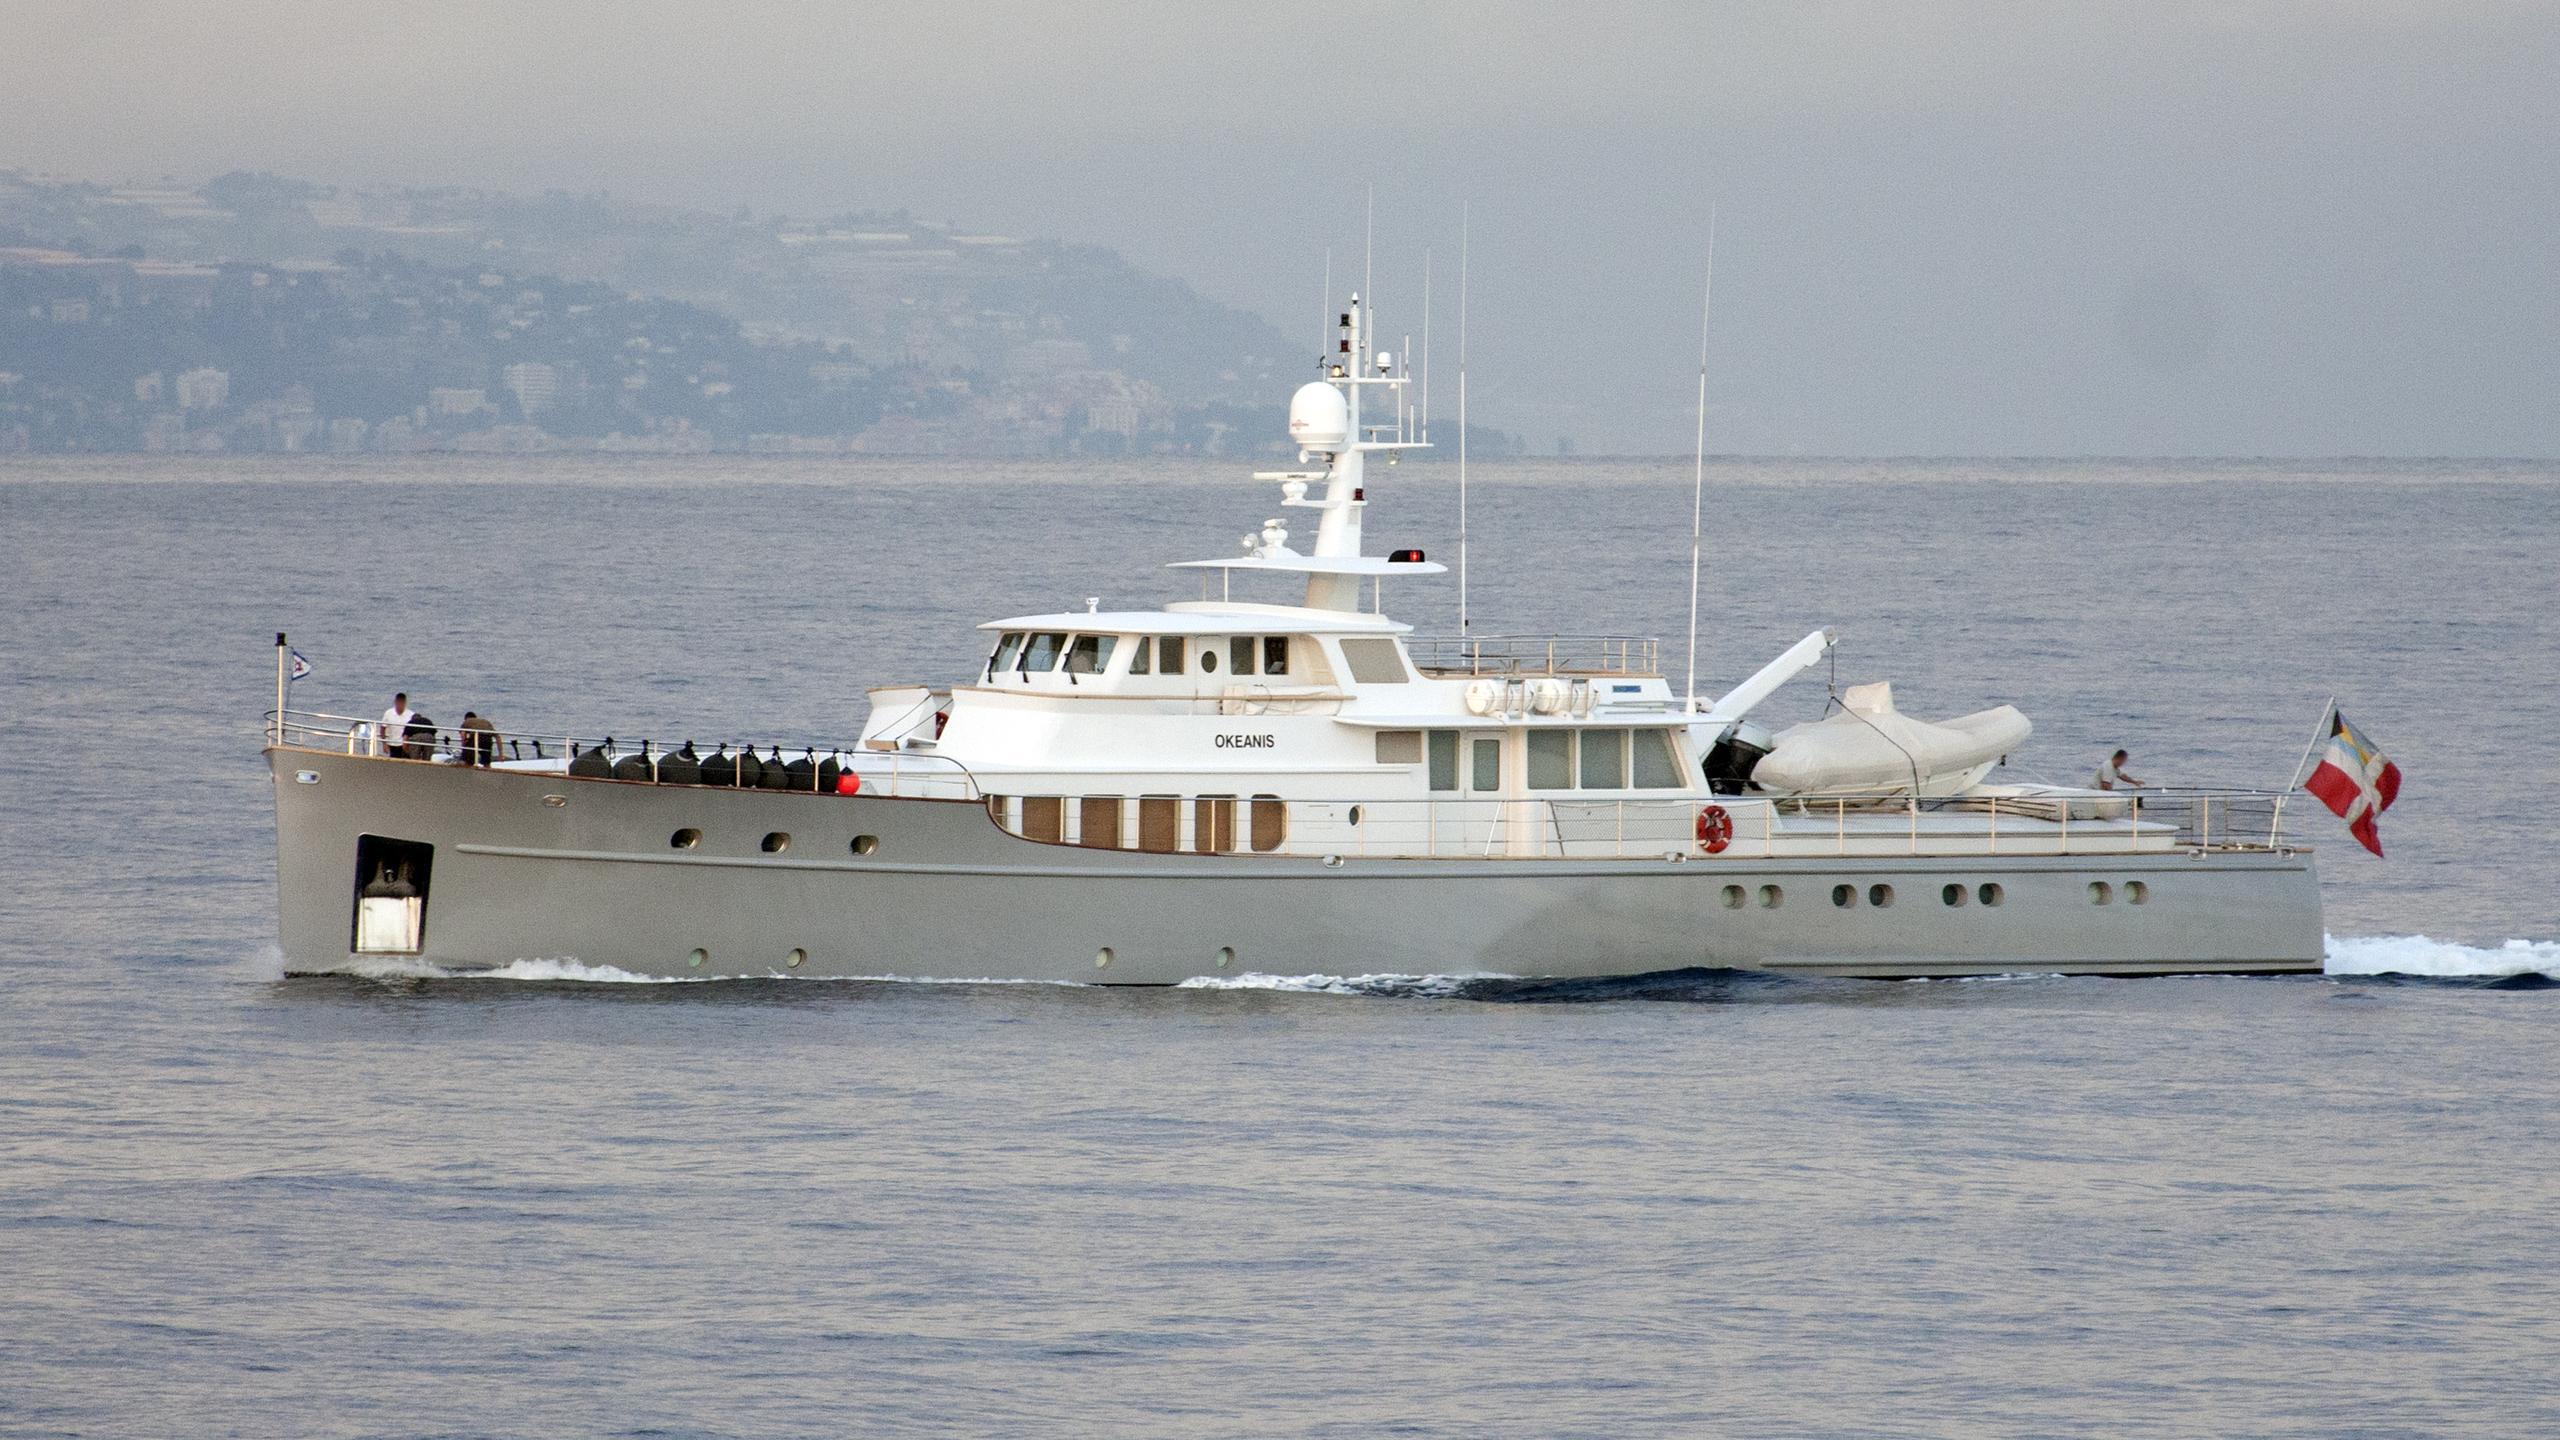 okeanis-motor-yacht-ocea-commuter-130-2003-40m-profile